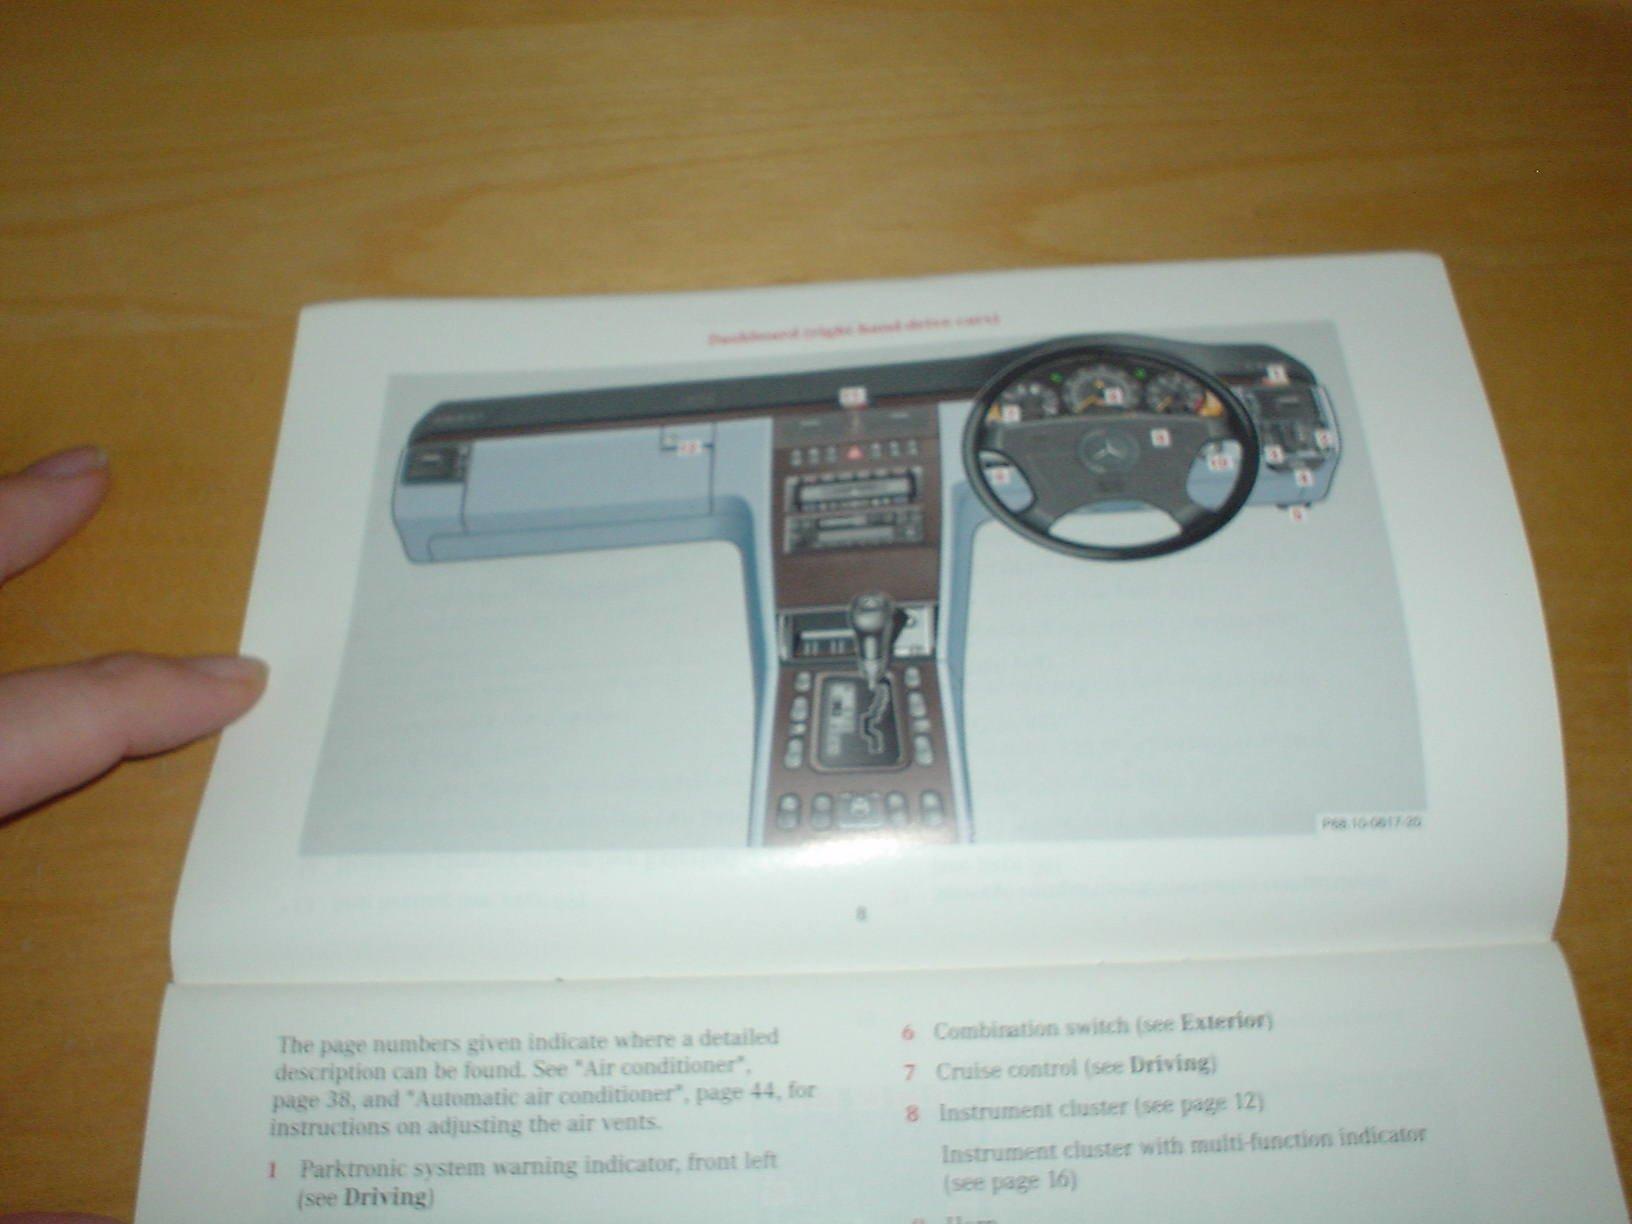 MERCEDES BENZ W210 E-CLASS OWNERS MANUAL HANDBOOK c/w WALLET 1995 - 2002 SALOON & ESTATE - E200 E240 E250 DIESEL E280 4matic E290 TURBODIESEL E300 turbo ...